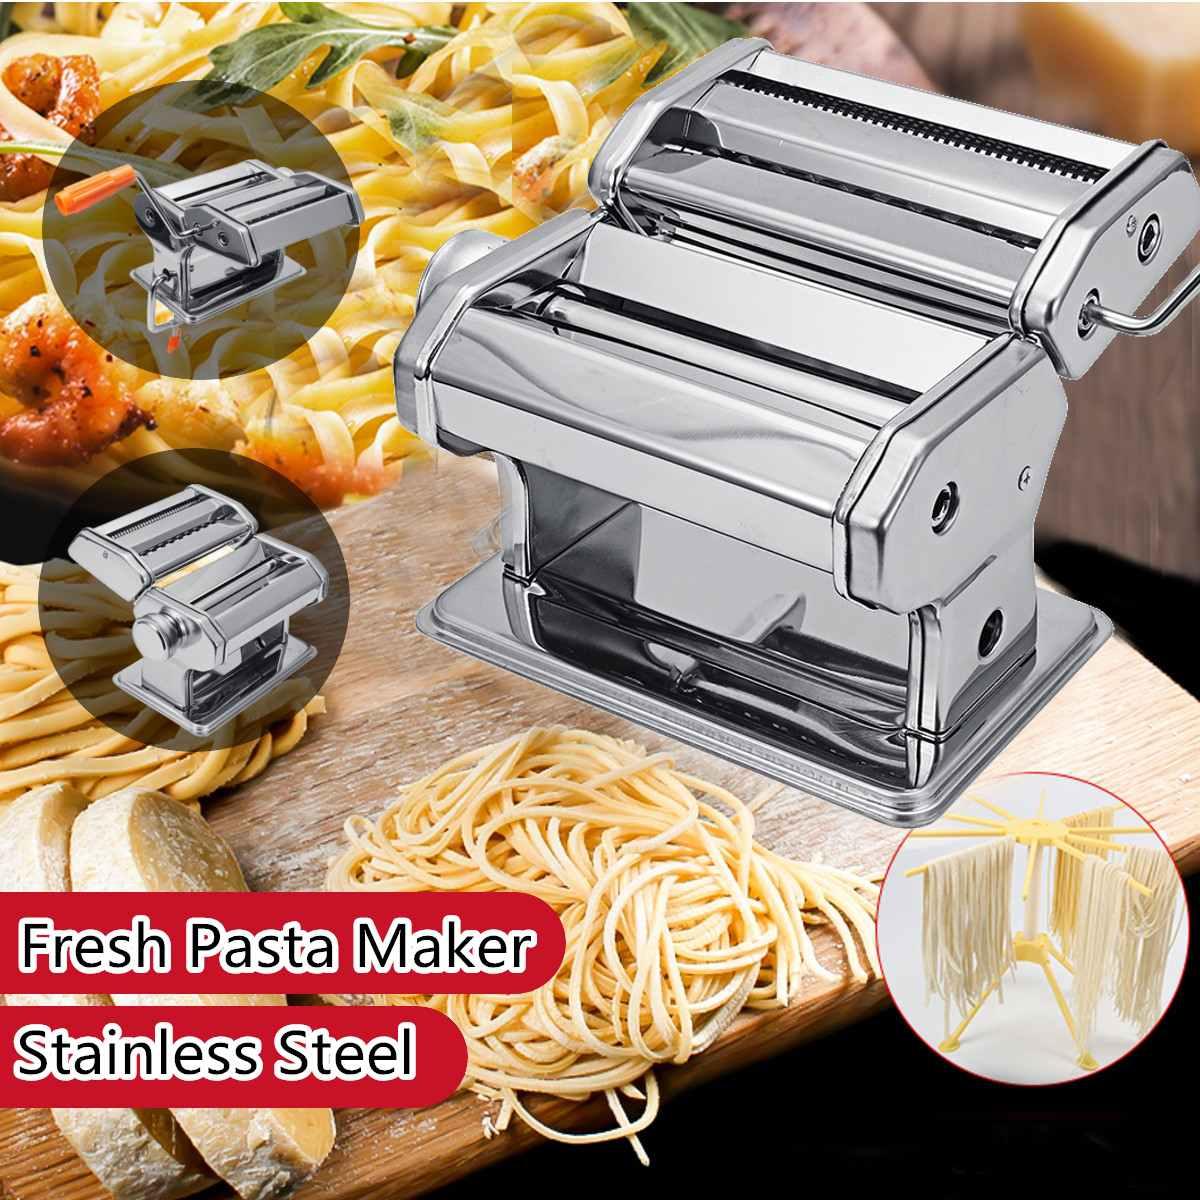 Hand Kurbel Edelstahl Frische Pasta Maker Roller Maschine Für Spaghetti Nudel Knödel Maker